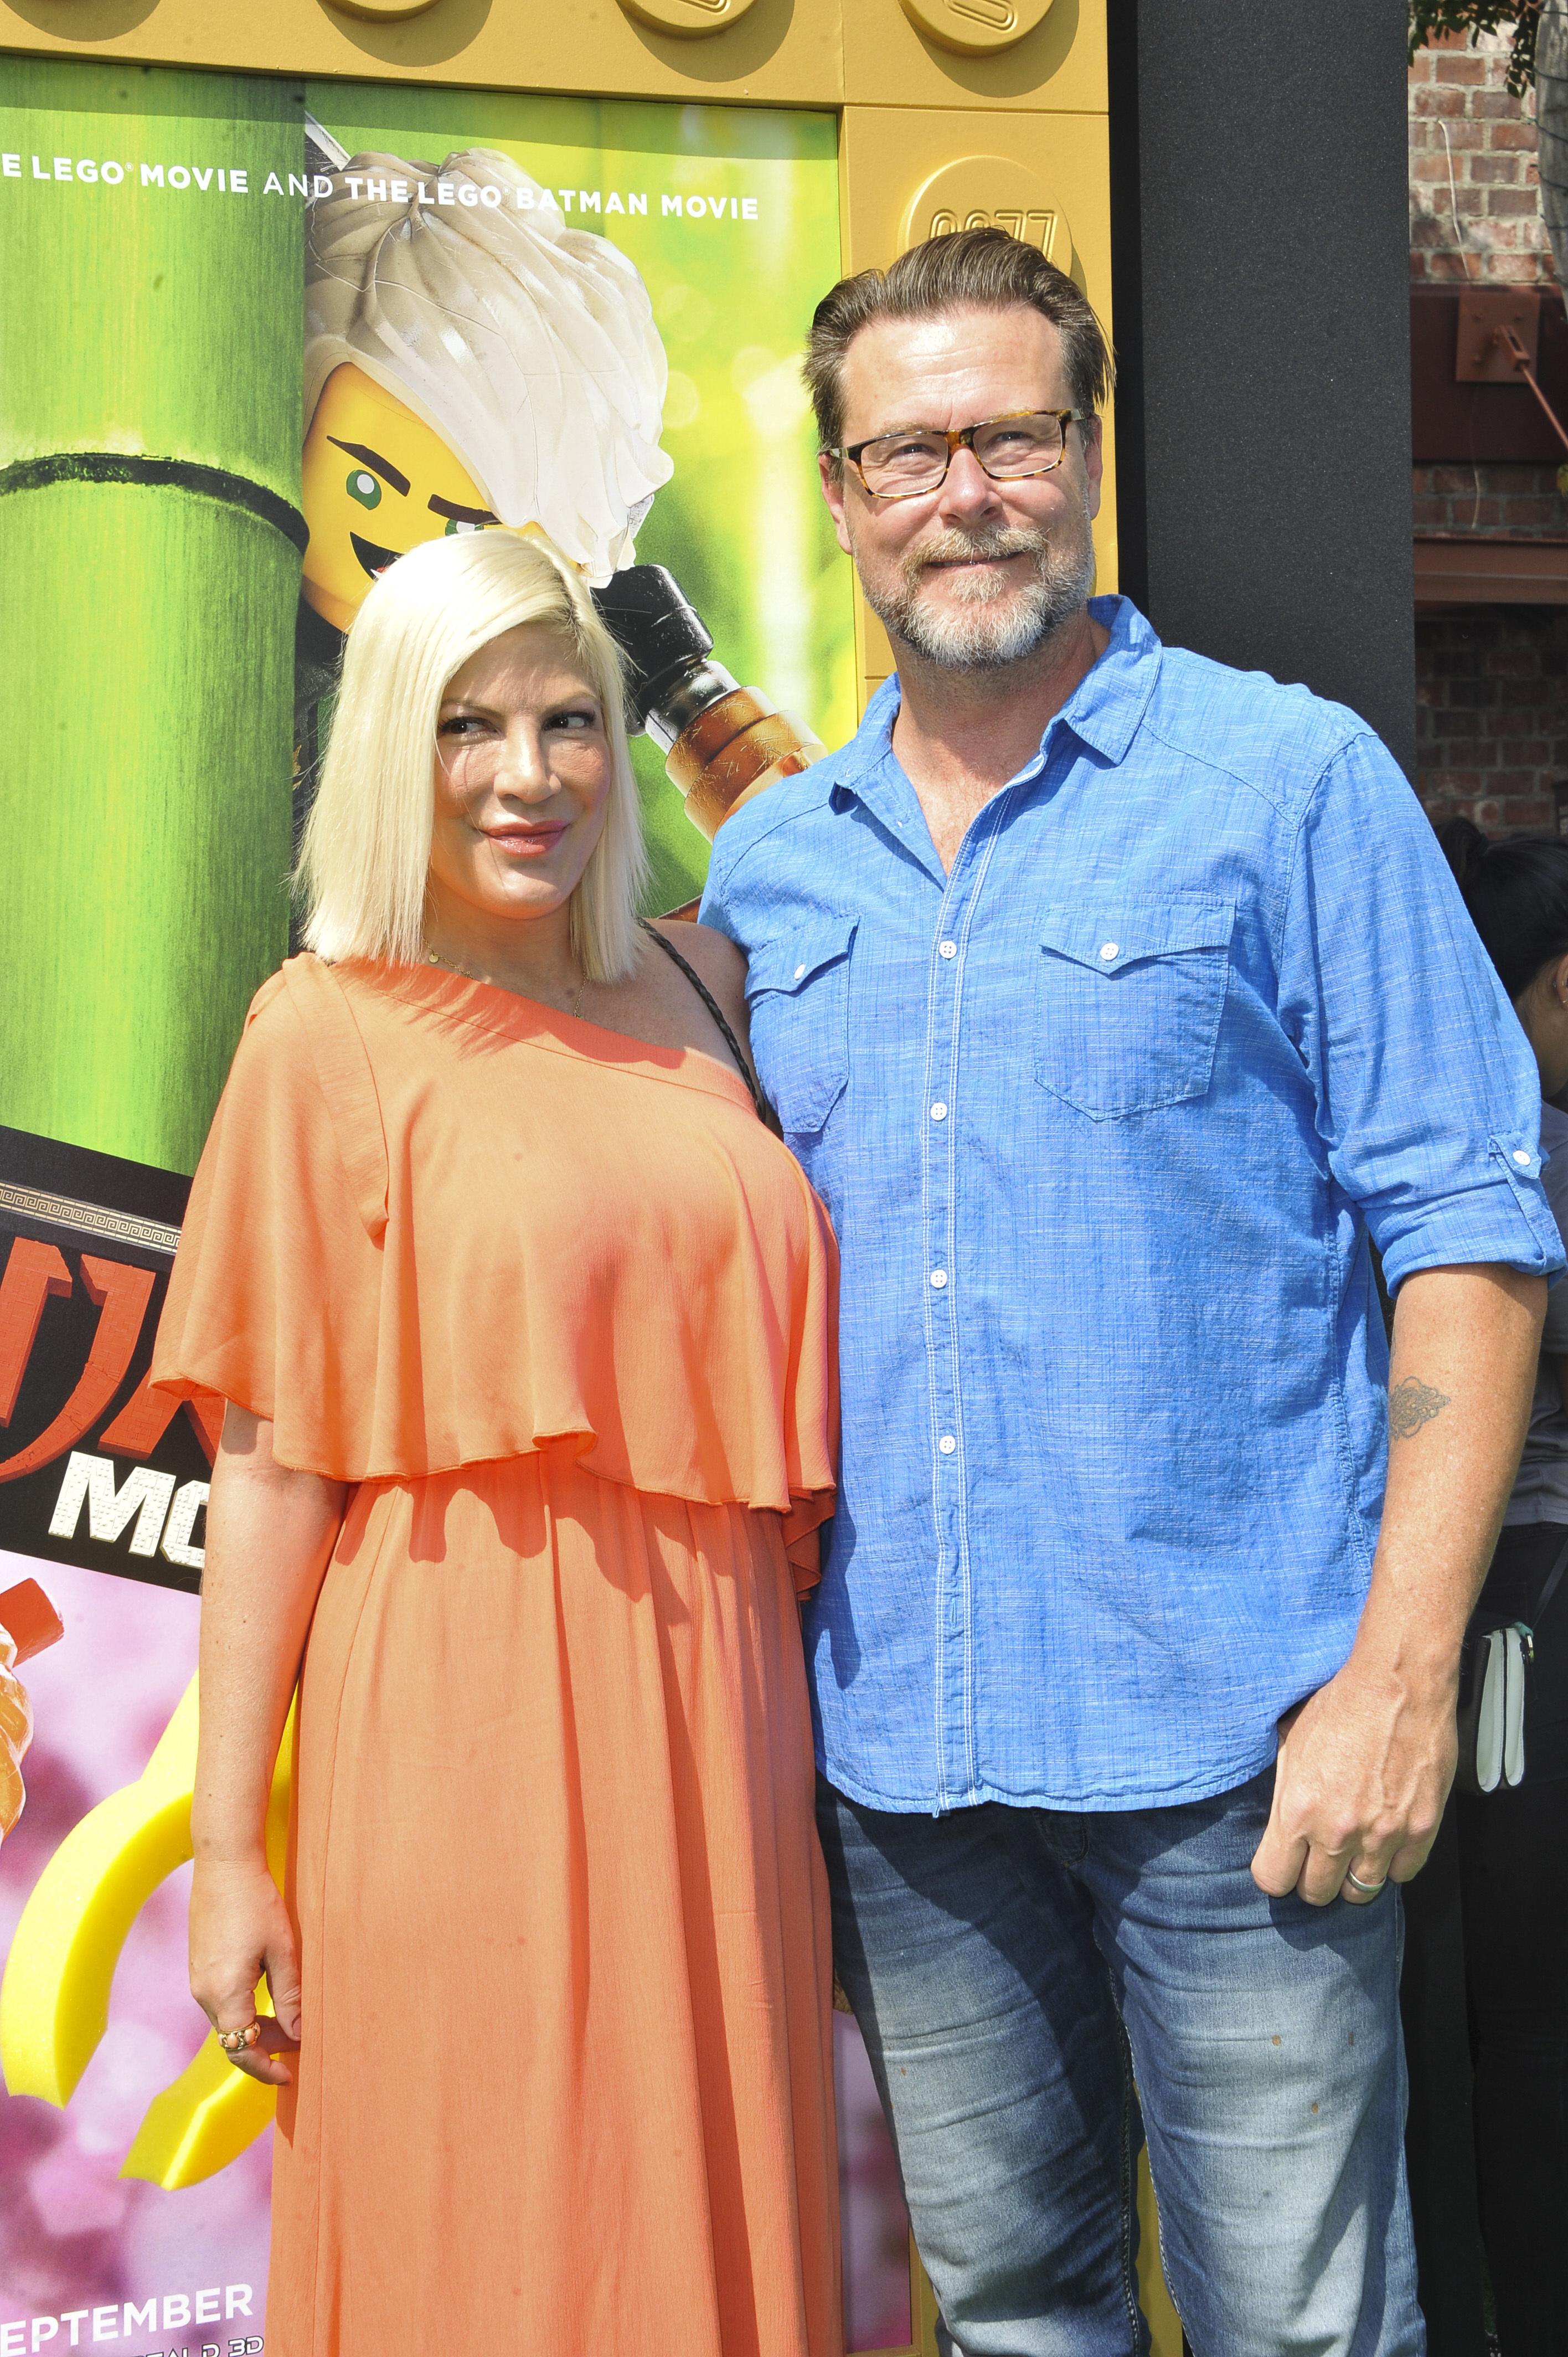 Tori Spelling and Dean McDermott attends 'The LEGO Ninjago Movie' on Los Angeles on Sept. 16, 2017.